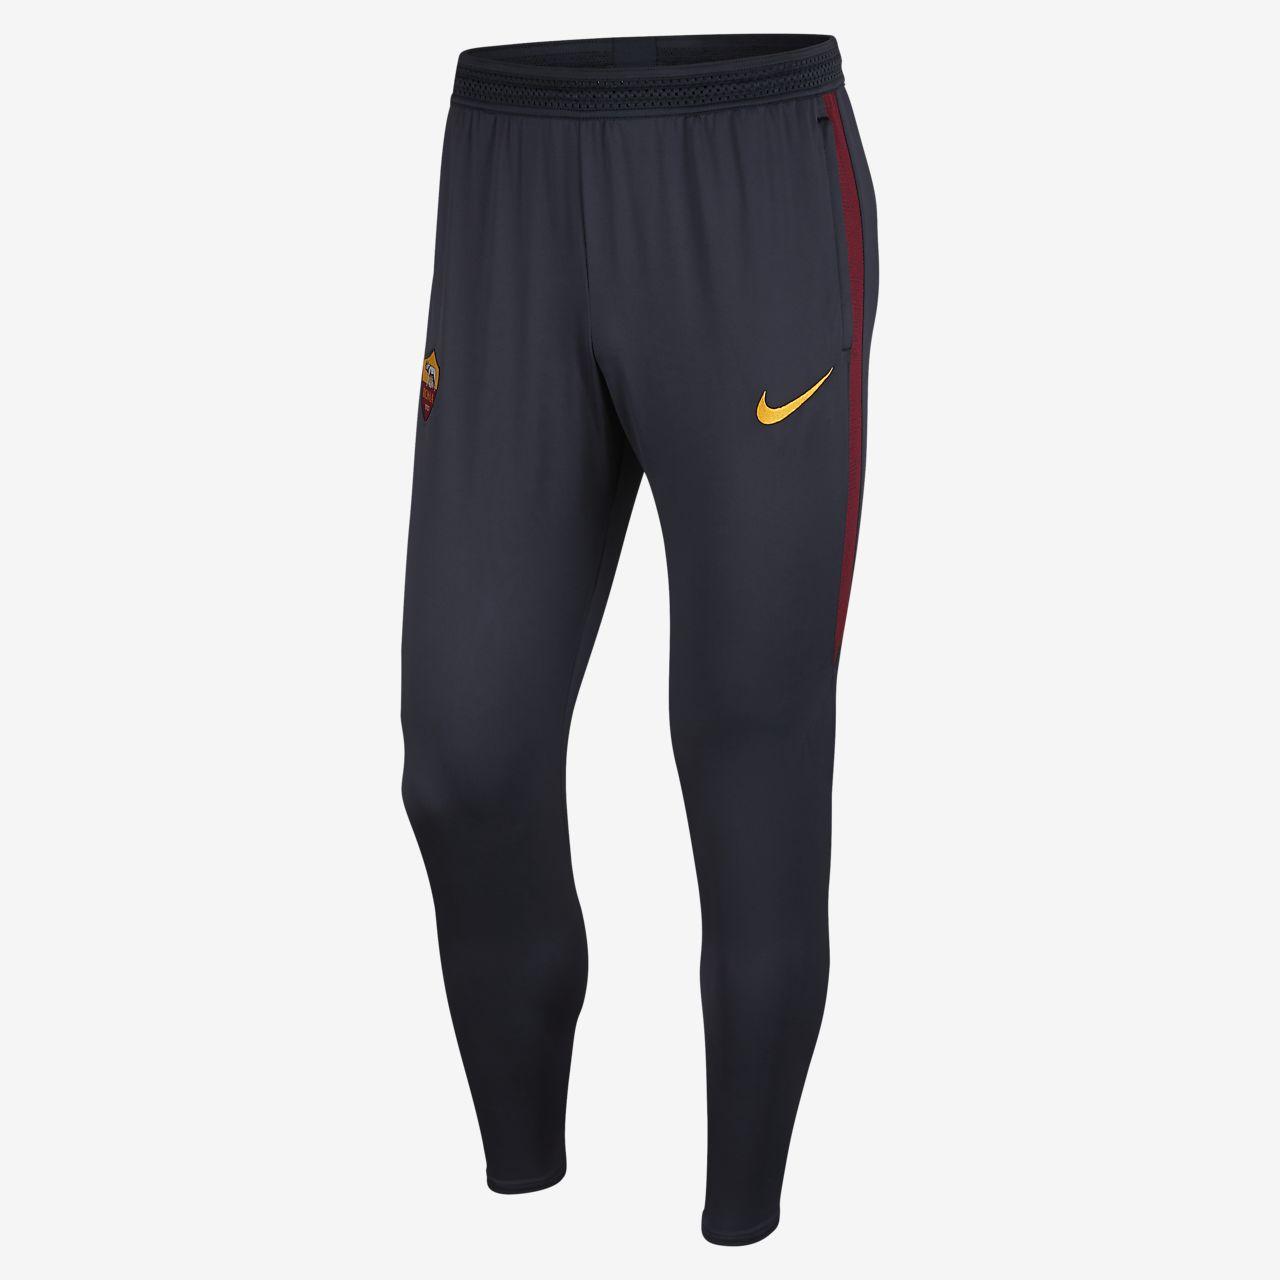 Nike Dri-FIT A.S. Rom Strike Herren-Fußballhose